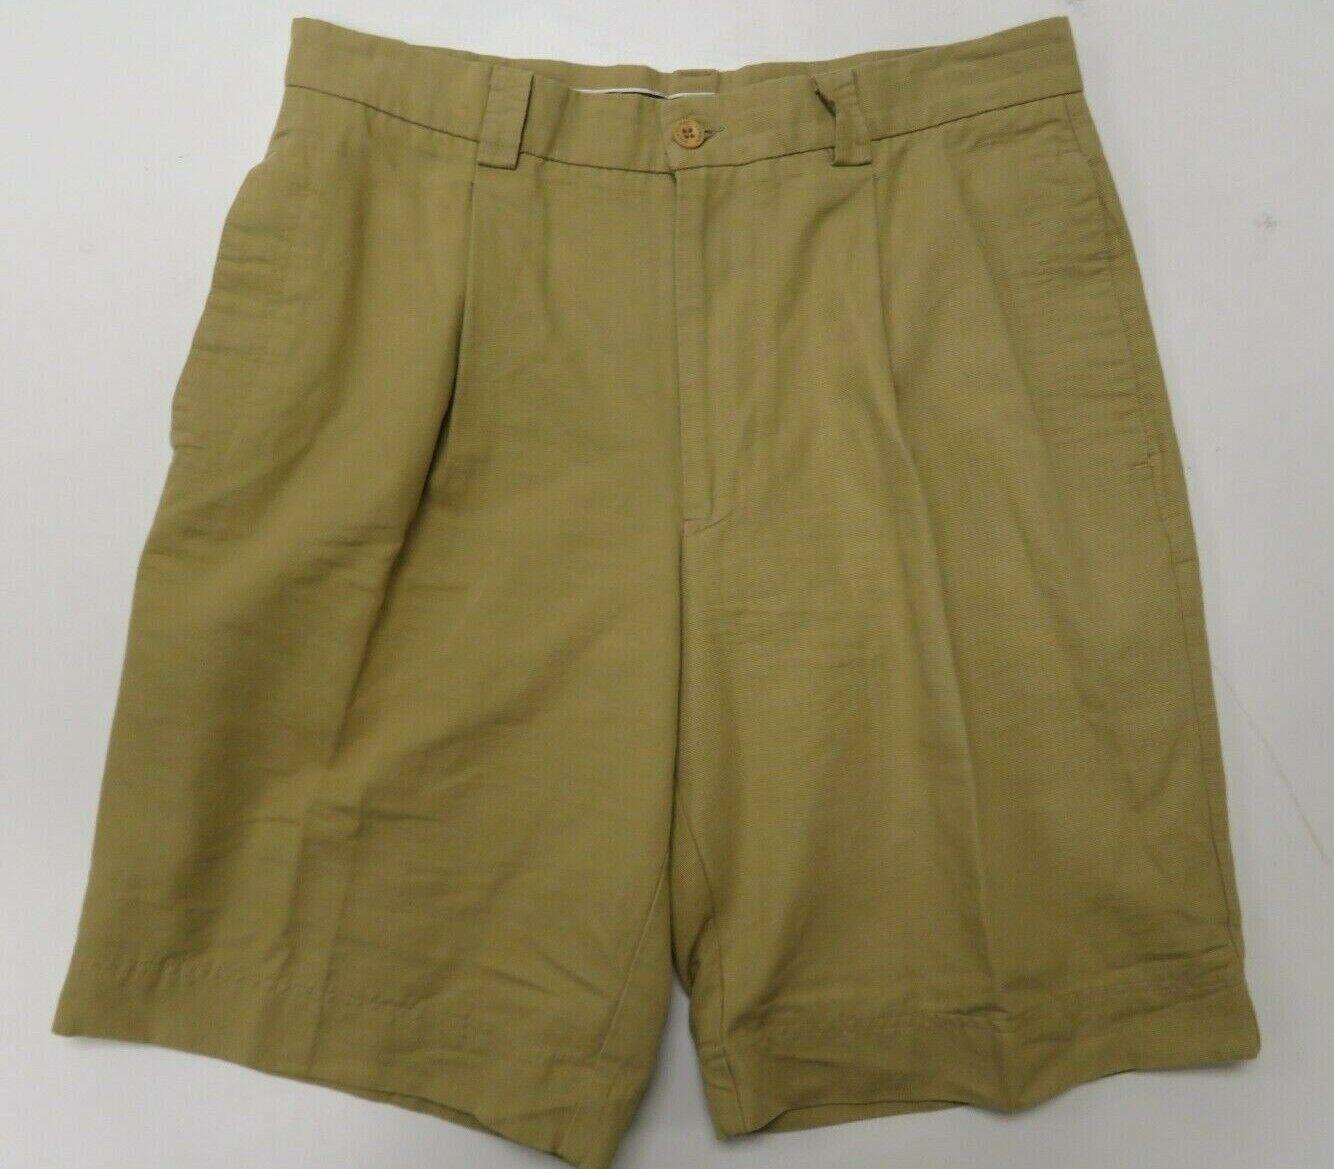 Aquascutum Mens Shorts Sz 32 Beige Khaki Pleated Made in